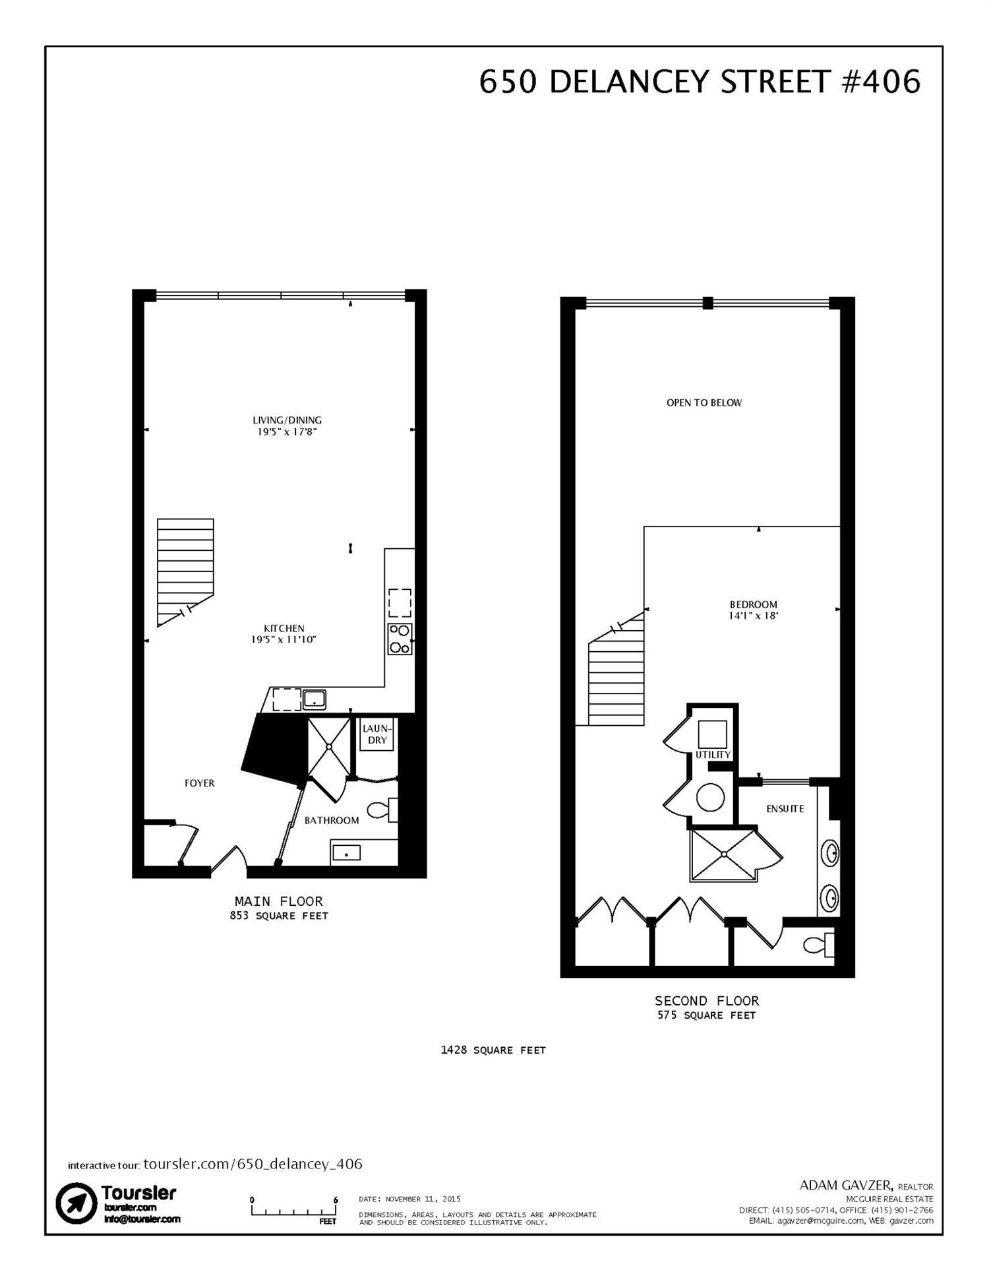 650 Delancey St #406, San Francisco, CA 94107 | Floor ...